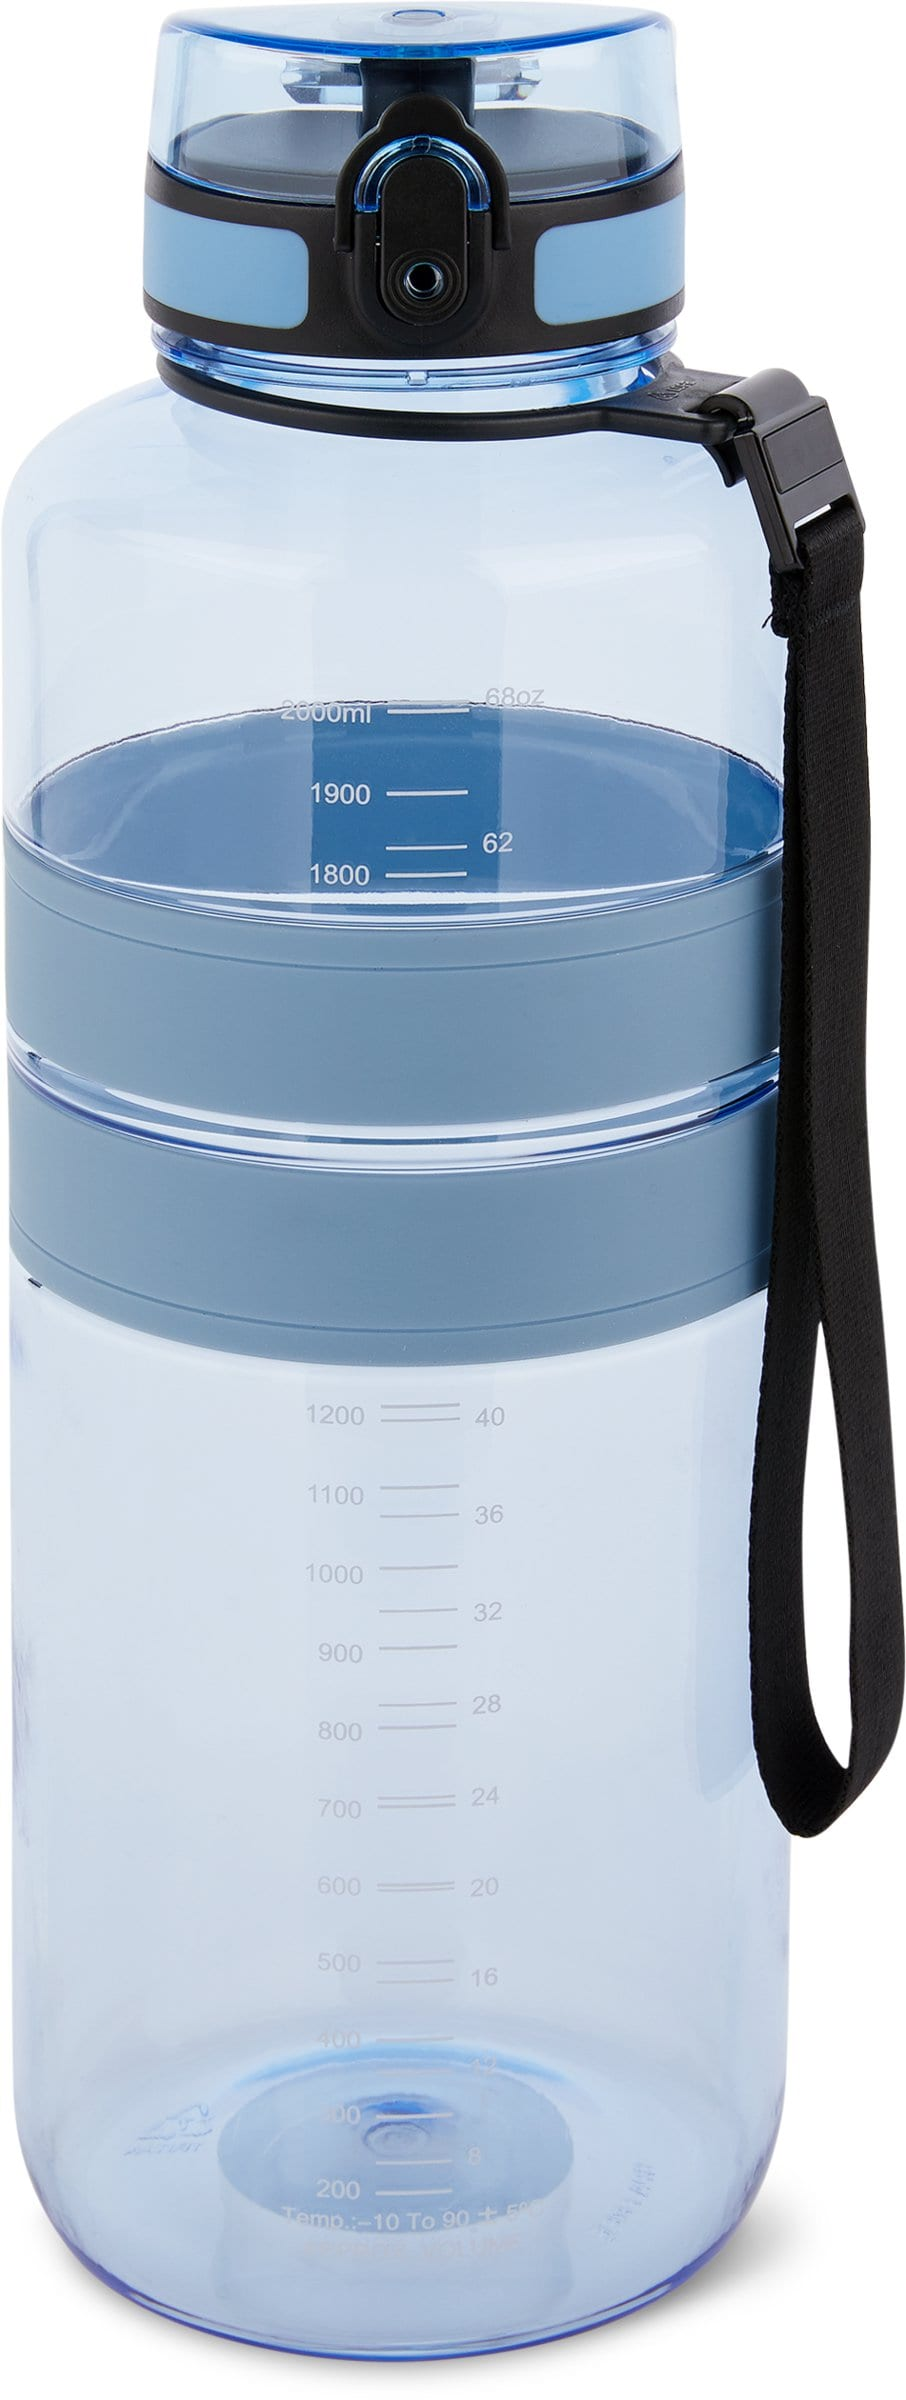 Cucina & Tavola Trinkflasche 2L